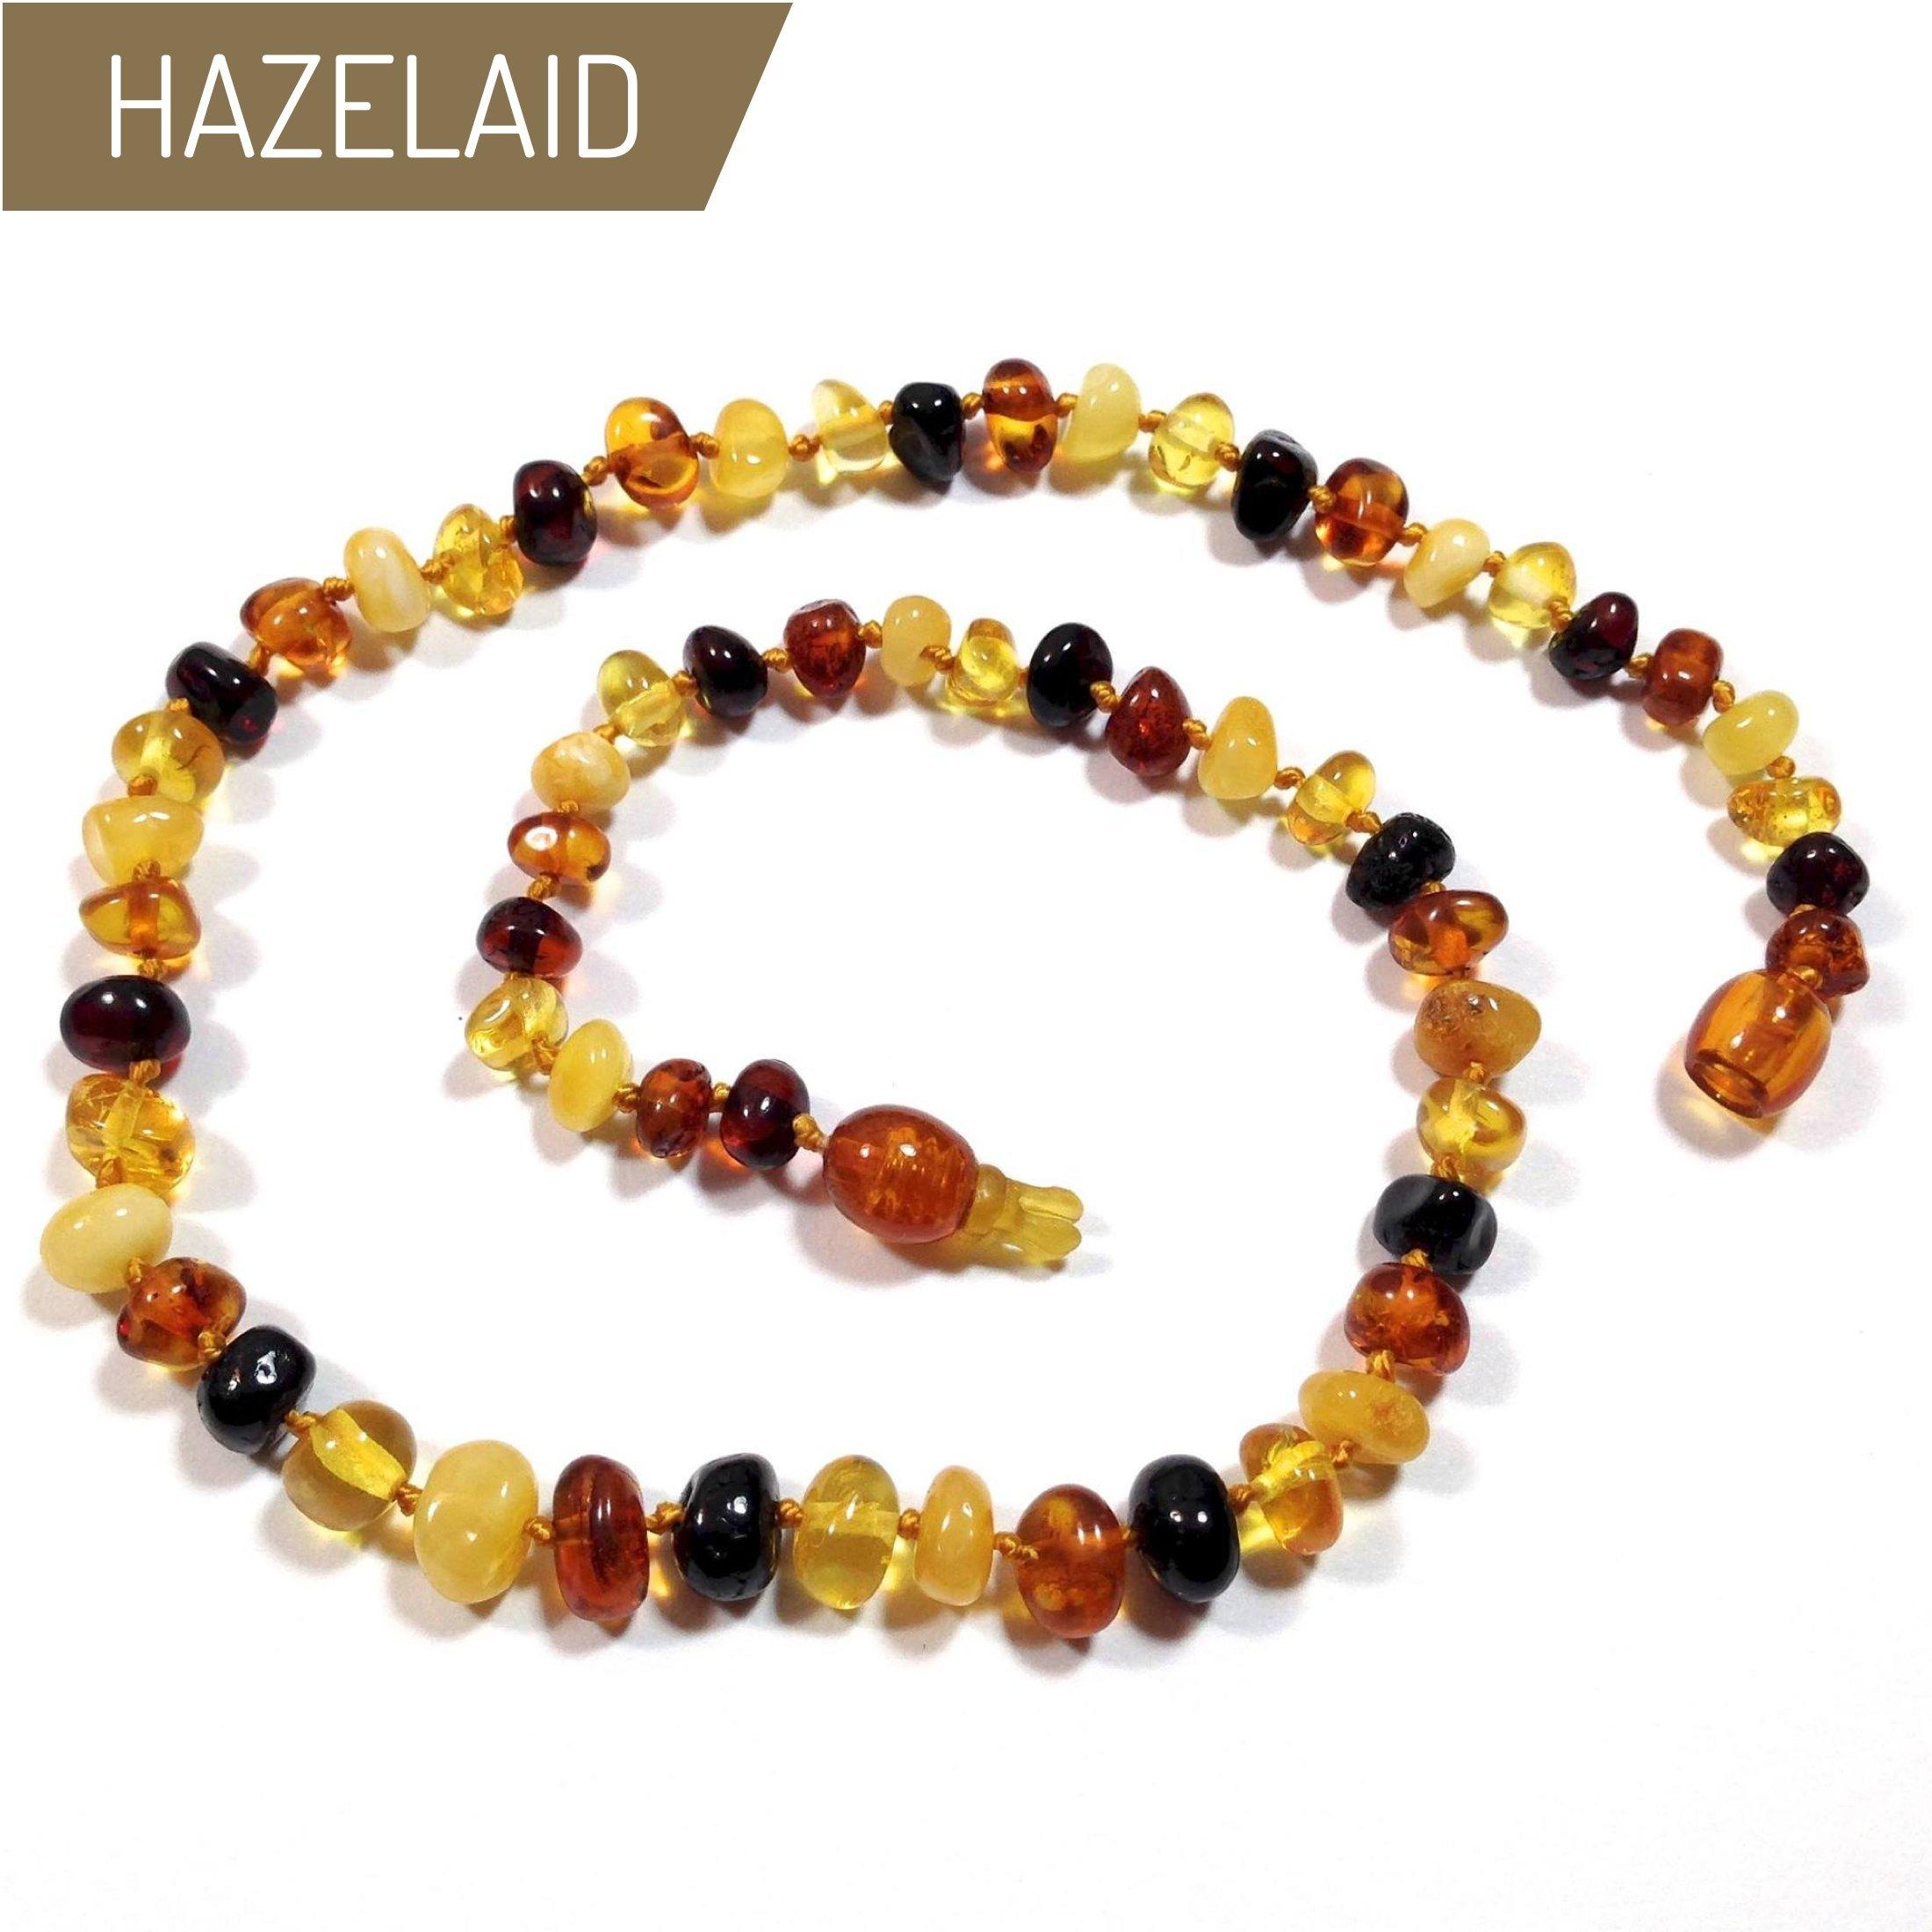 Hazelaid (TM) 12'' Pop-Clasp Baltic Amber Multicolored Necklace